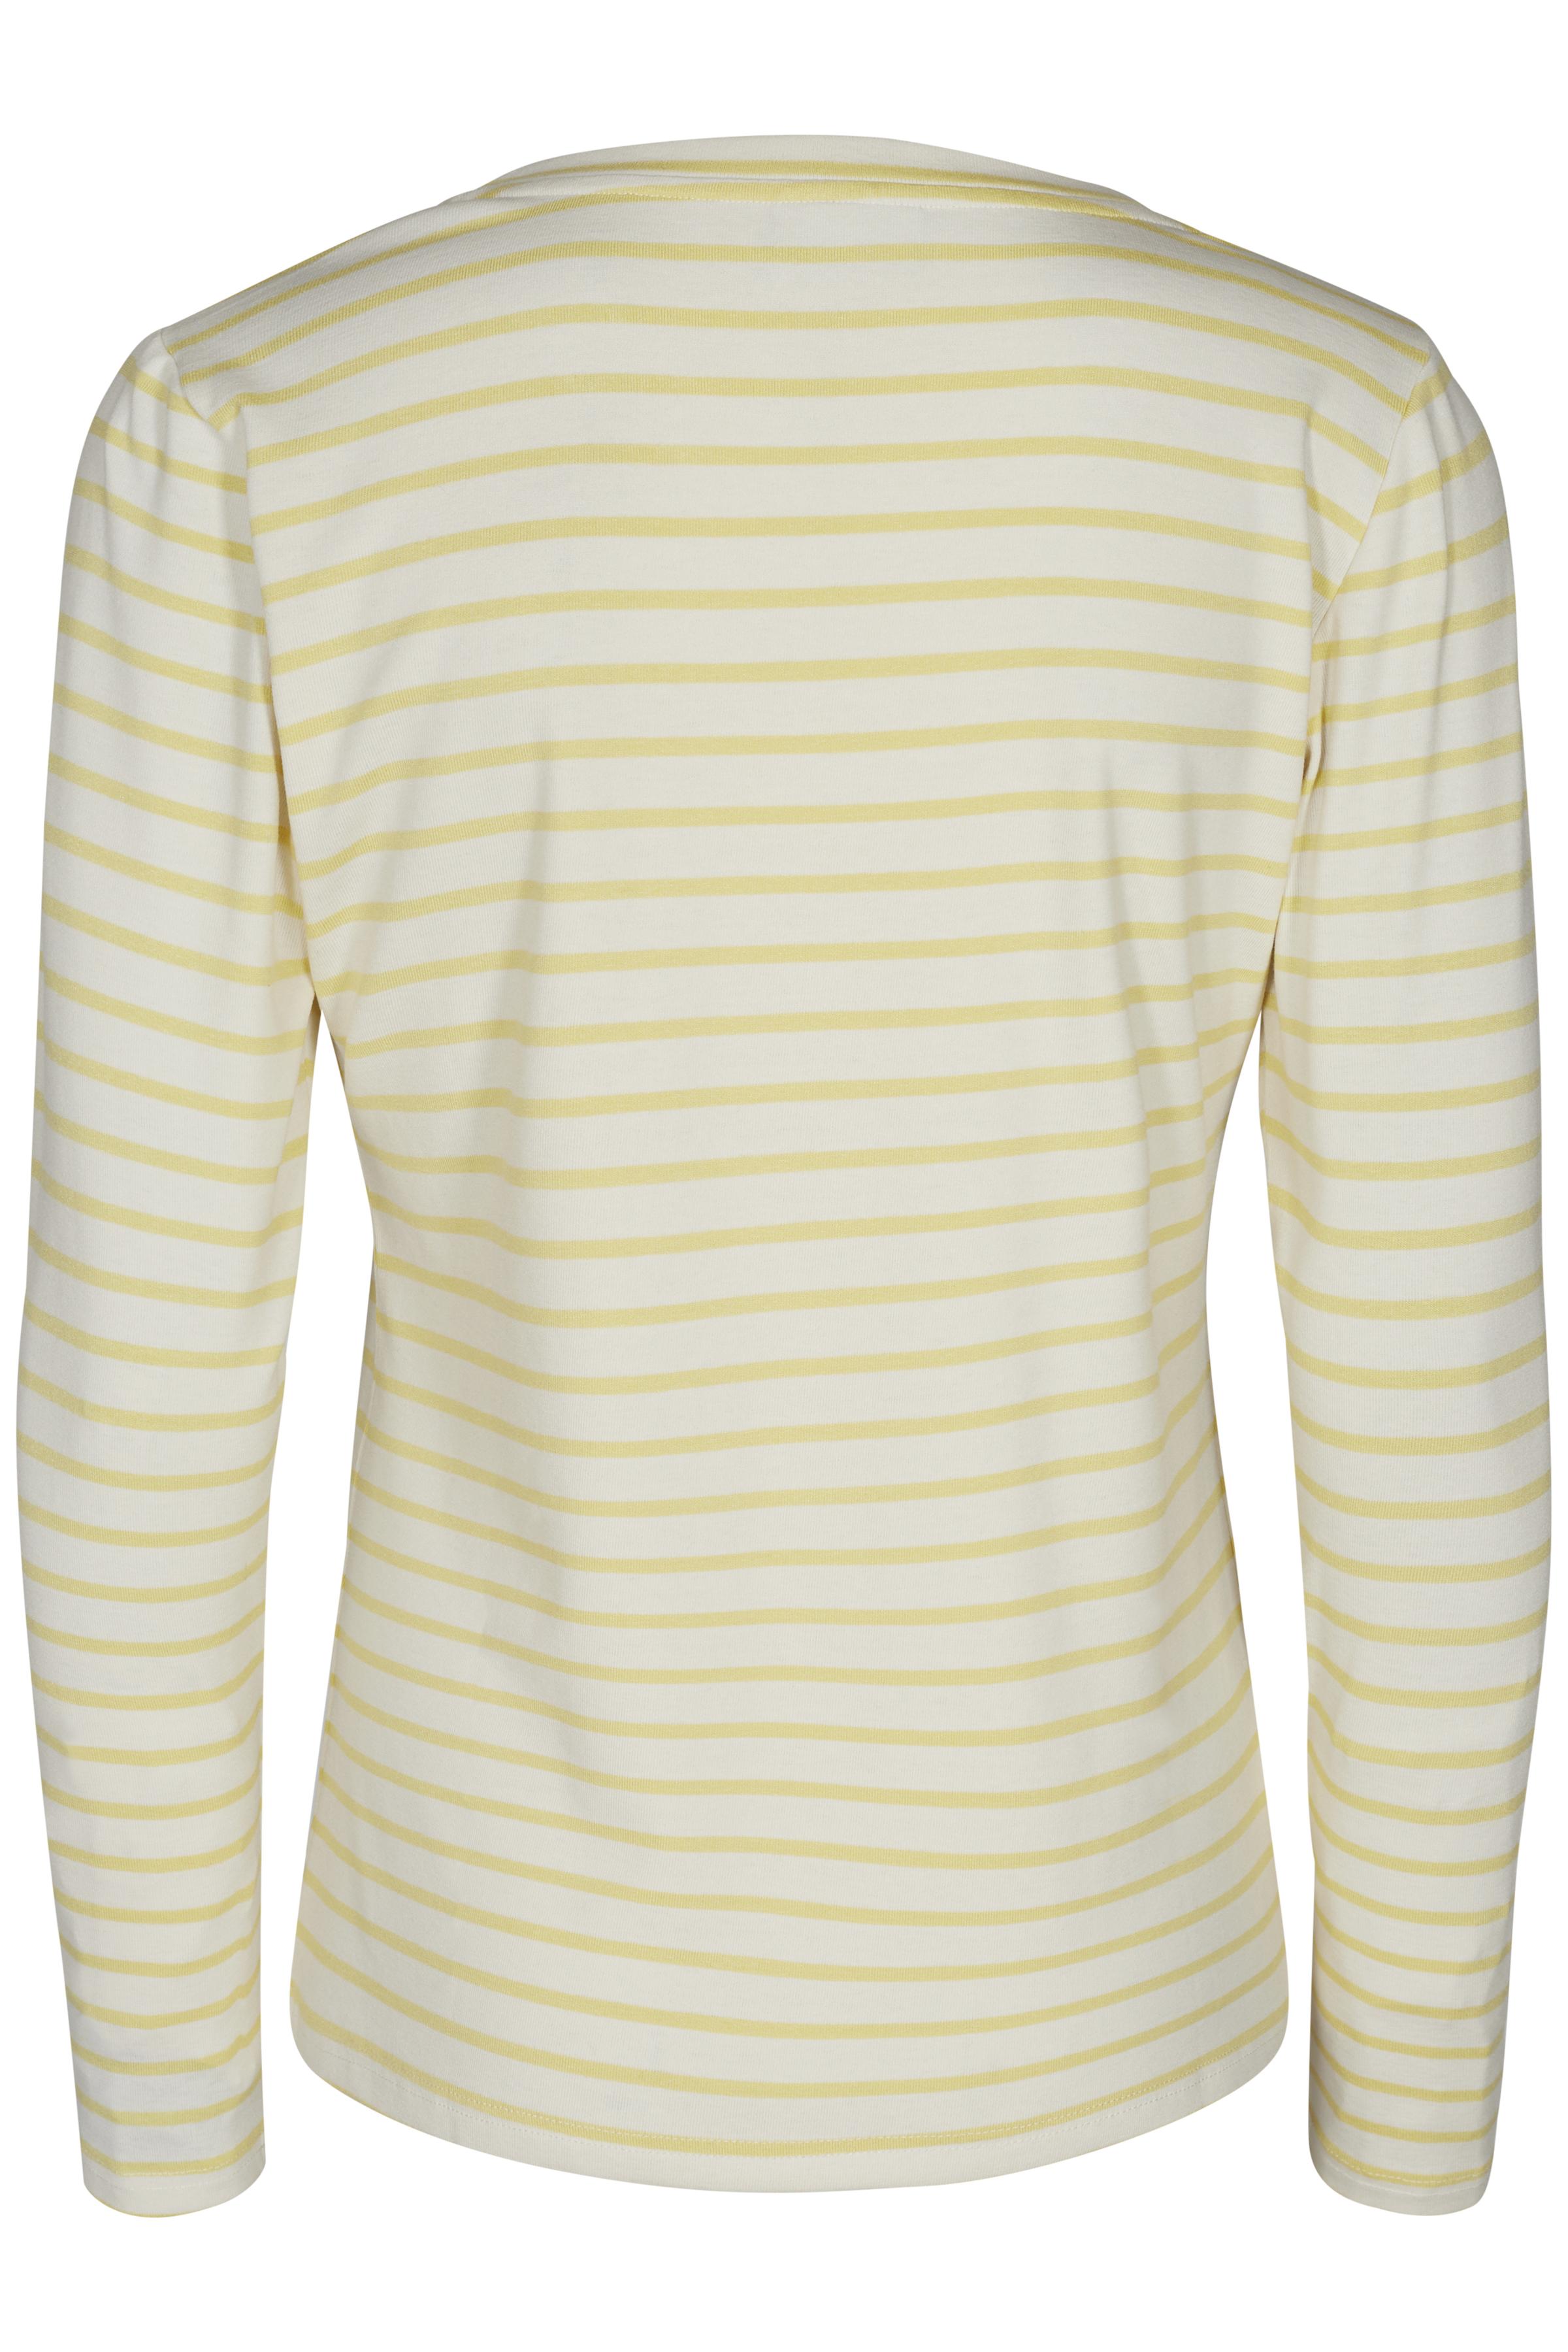 Geel/off-white T-shirt lange mouw van Kaffe – Door Geel/off-white T-shirt lange mouw van maat. XS-XXL hier